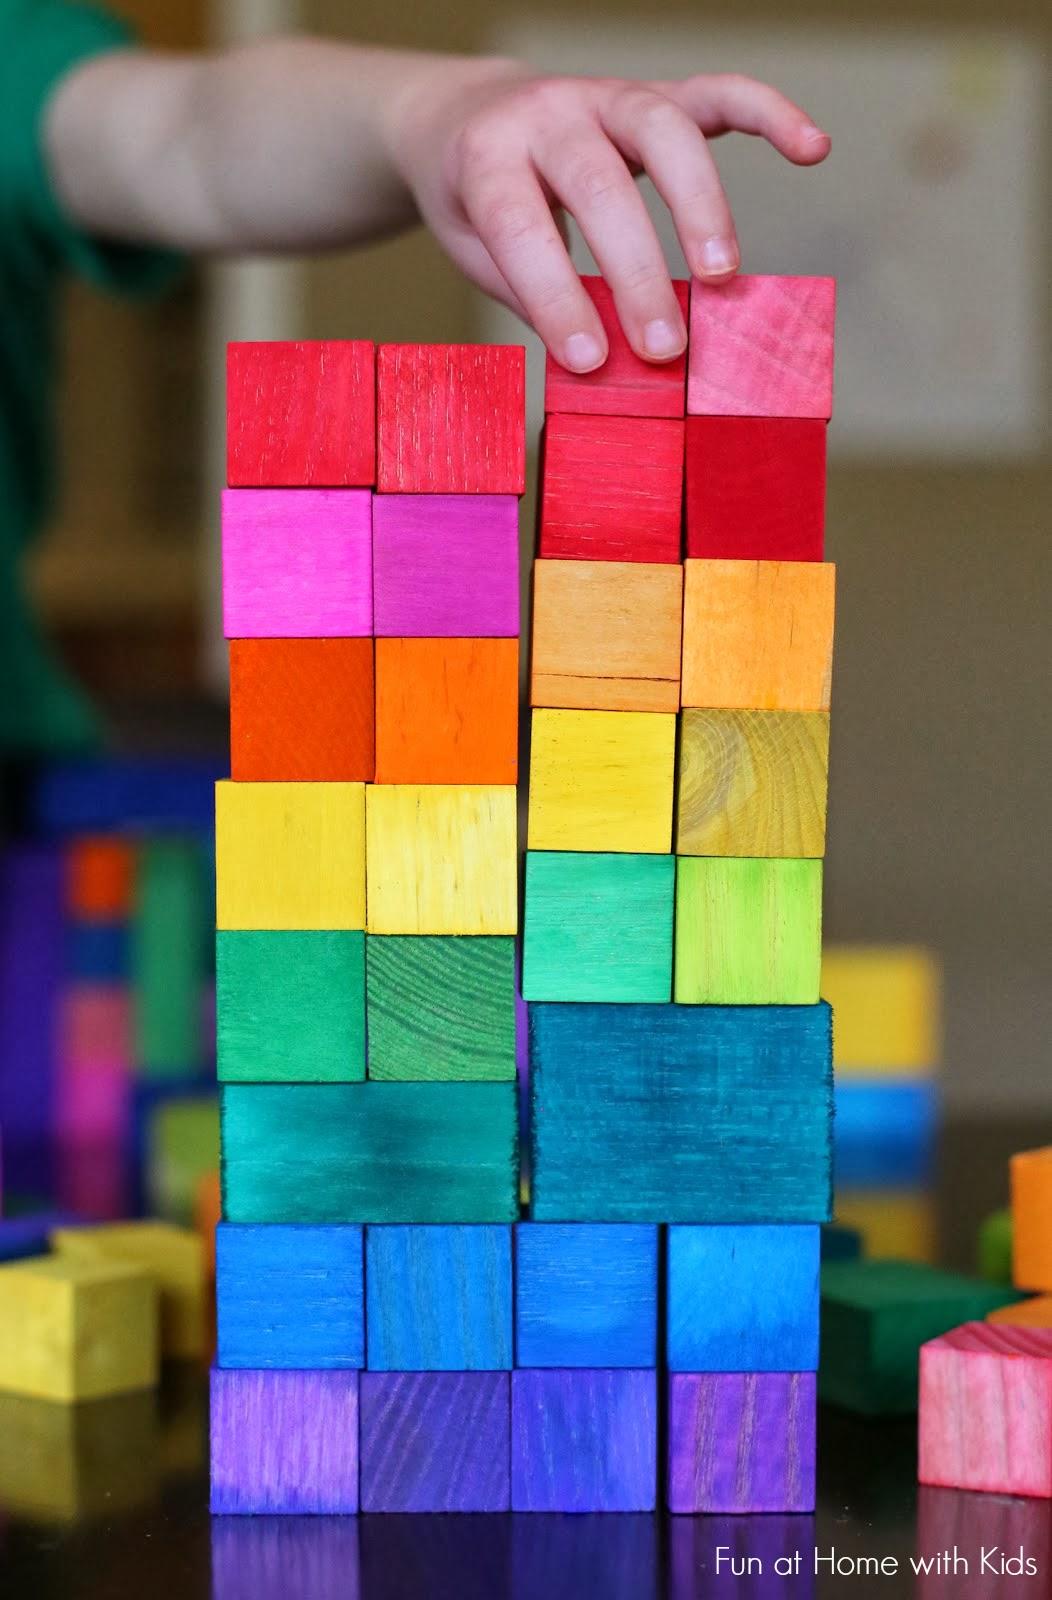 Diy dyed rainbow grimm style wooden blocks for Child craft wooden blocks